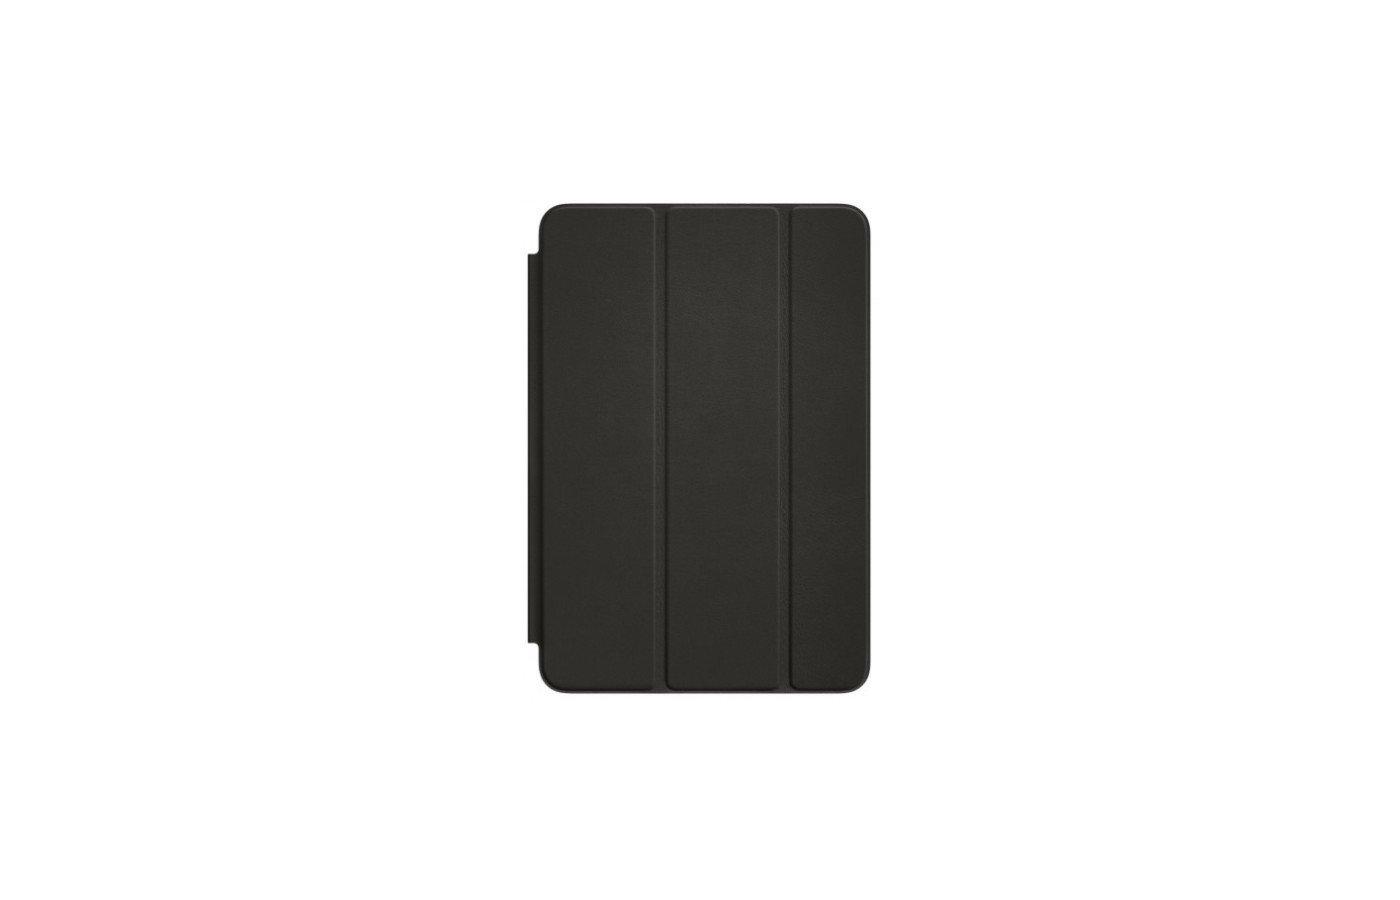 Чехол для планшетного ПК Apple iPad mini Smart Cover - Black (MGNC2ZM/A)